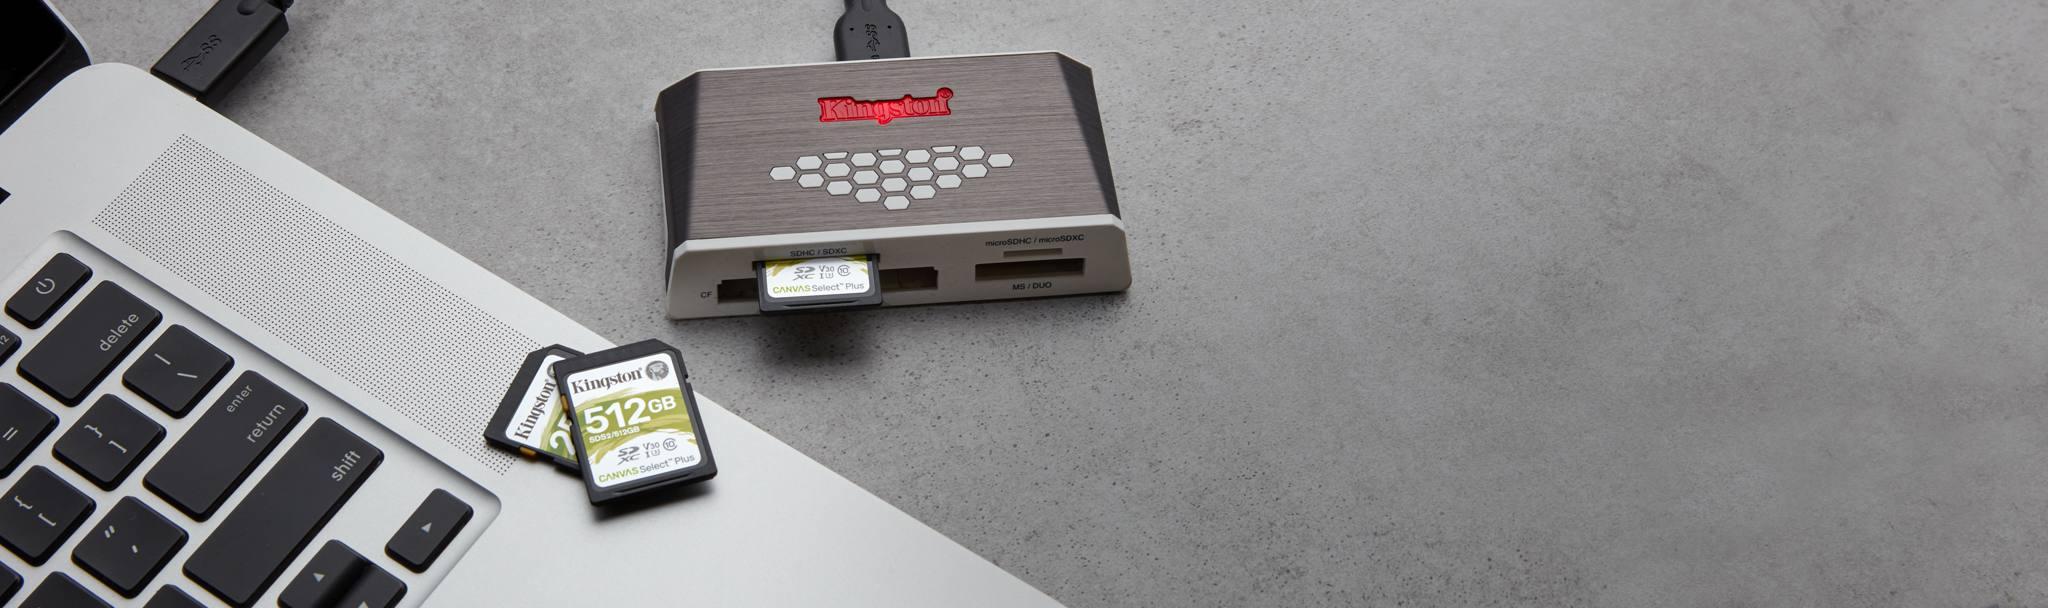 Kingston ذواكر SD و microSD